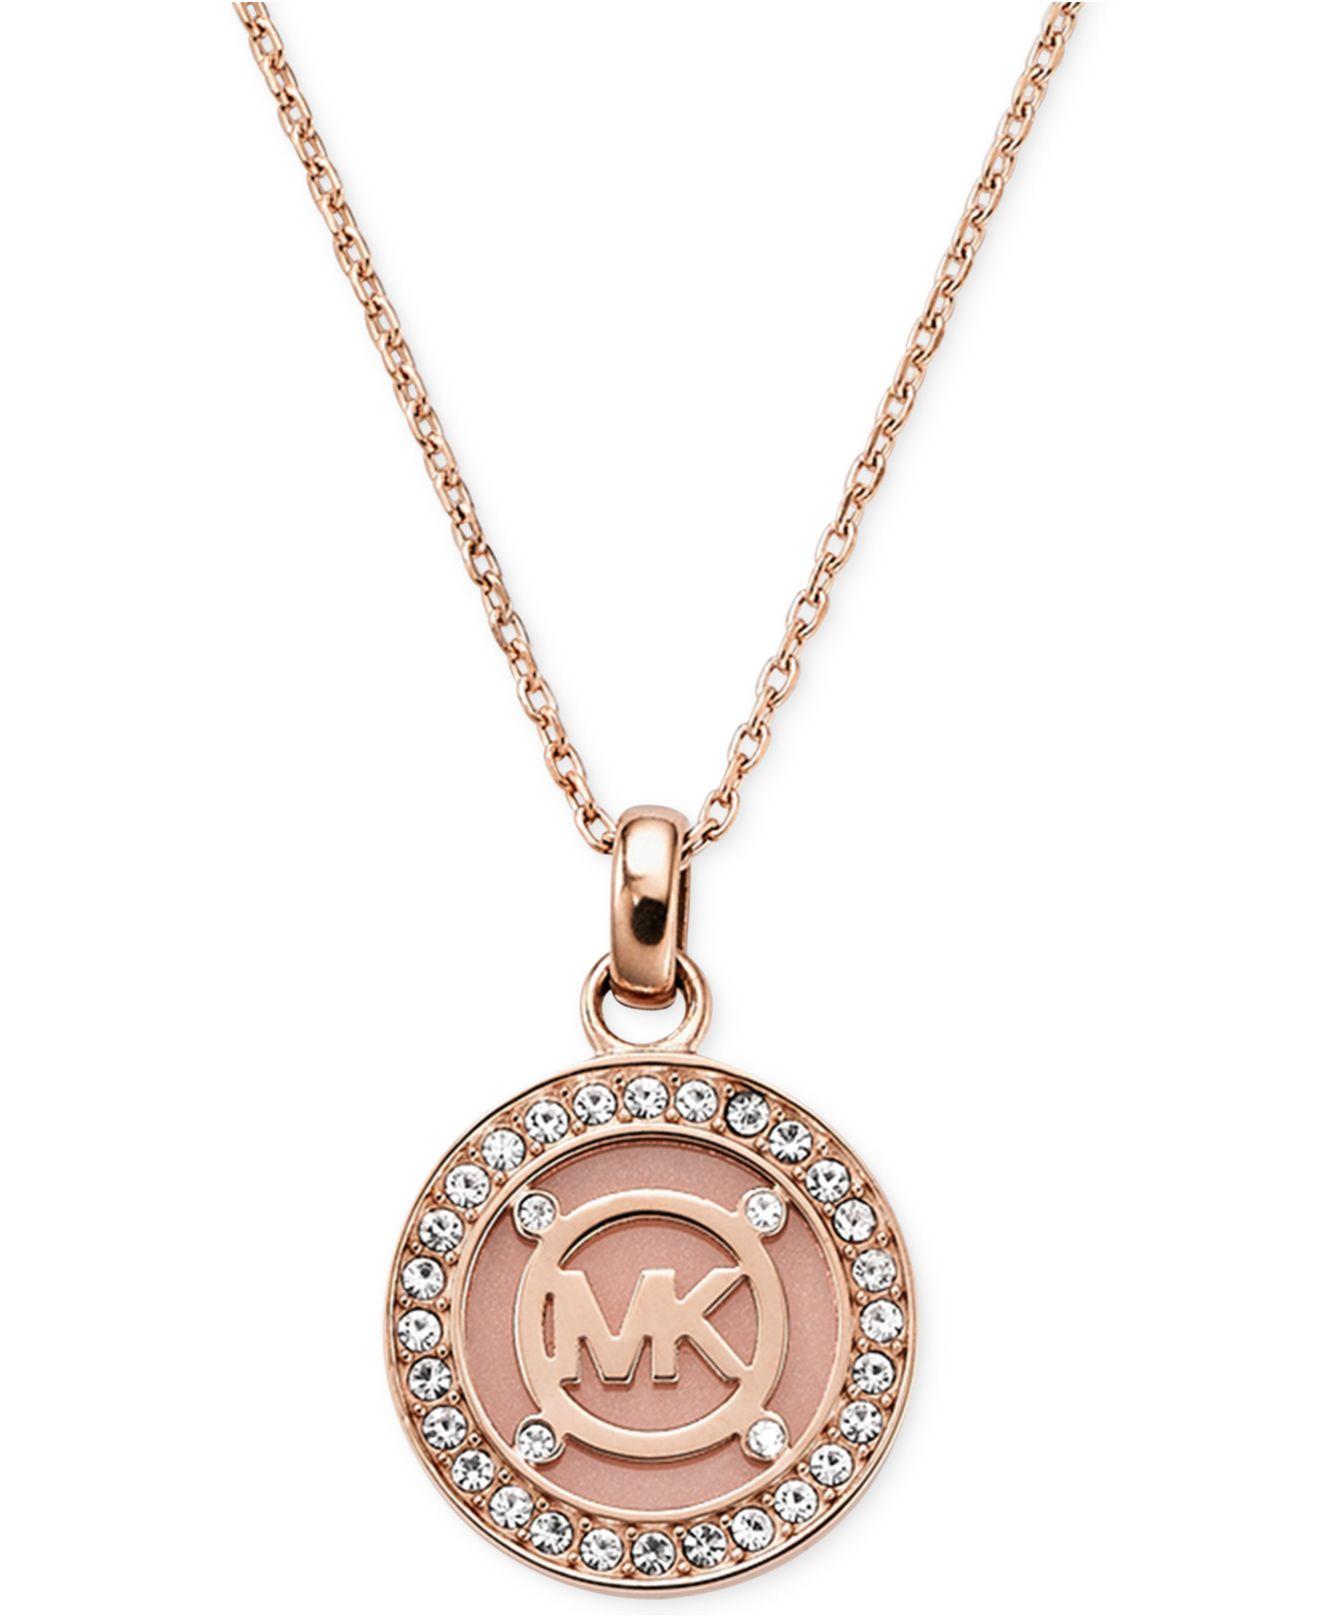 d5baf7db619e Lyst - Michael Kors Rose Gold-Tone Blush Mk Logo Disc Necklace ...